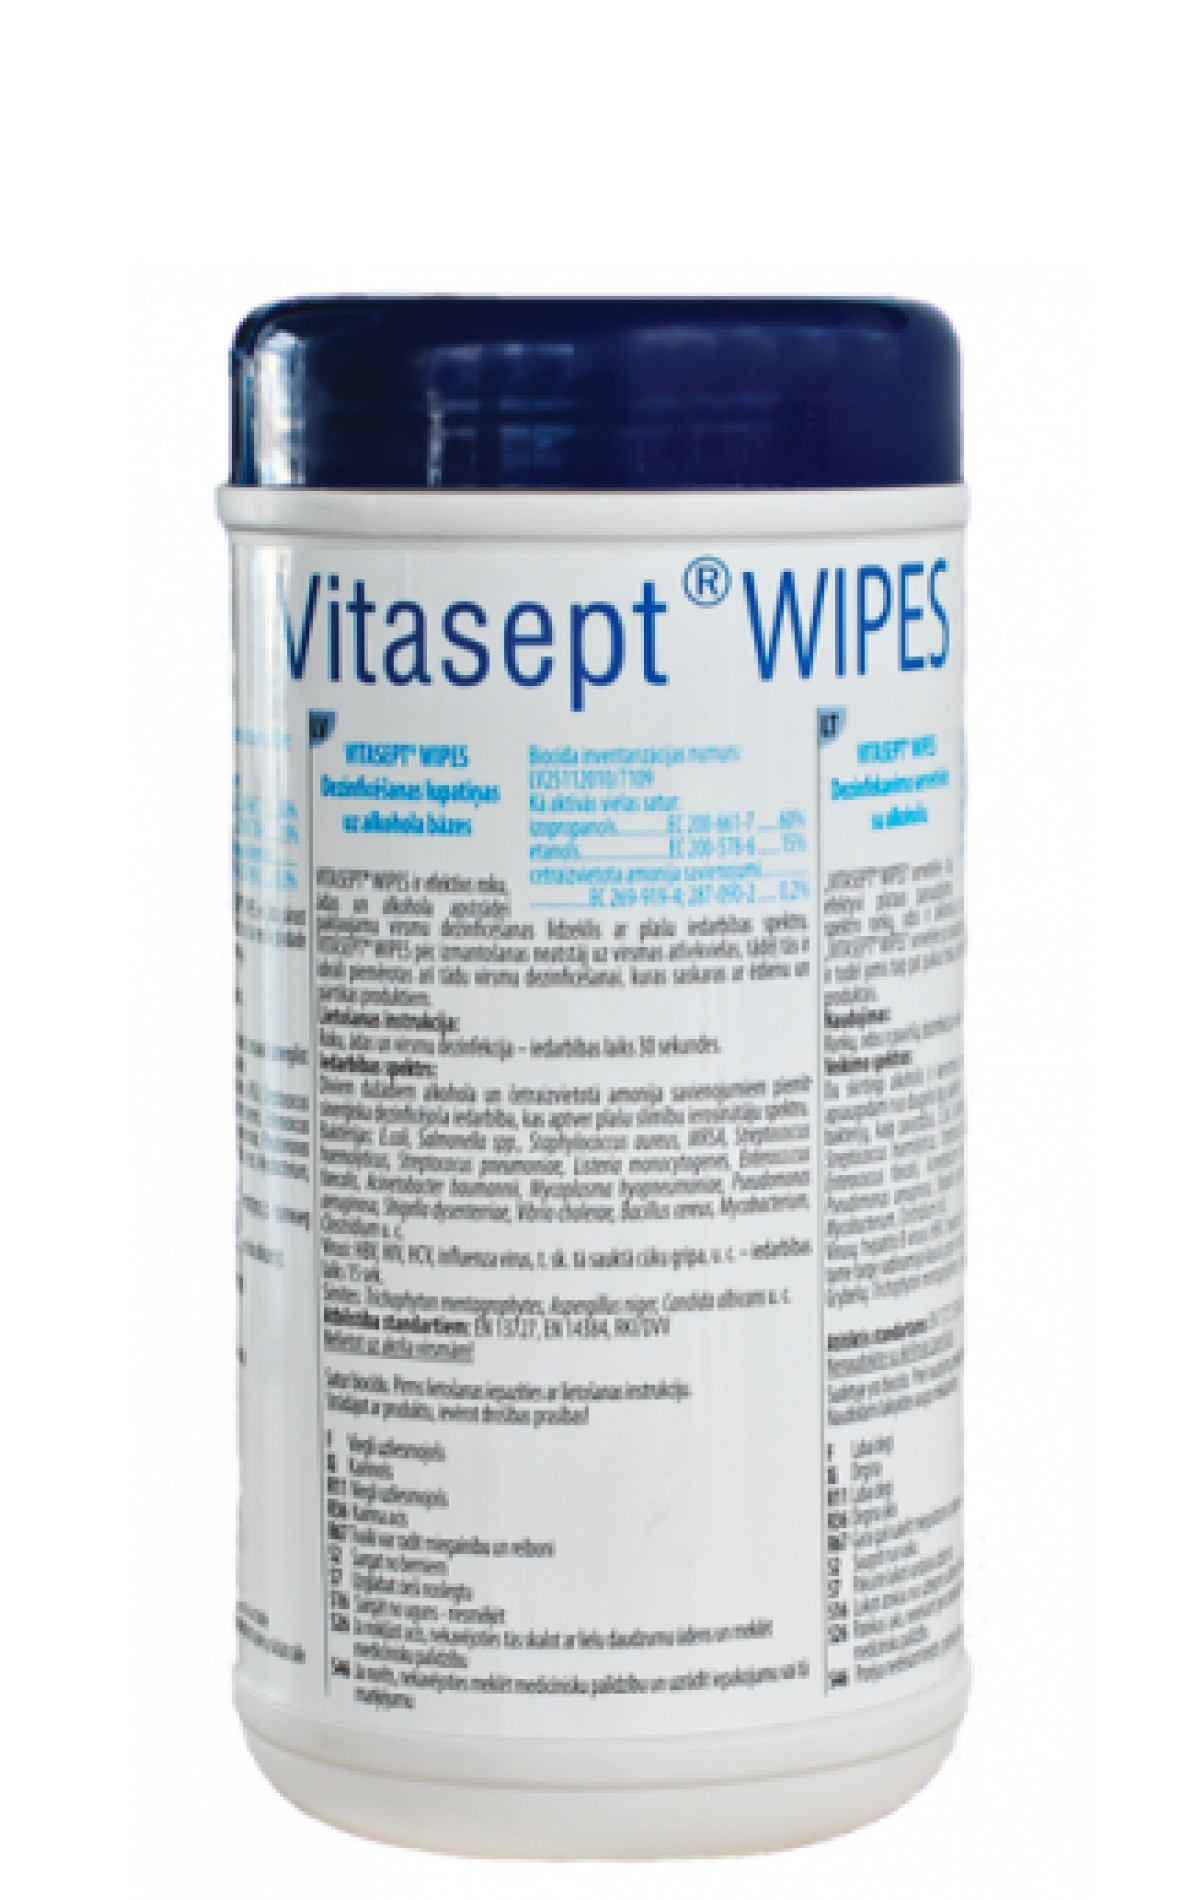 Dezinfekavimo servetėlės su alkoholiu Vitasept Wipes 120 vnt.-0